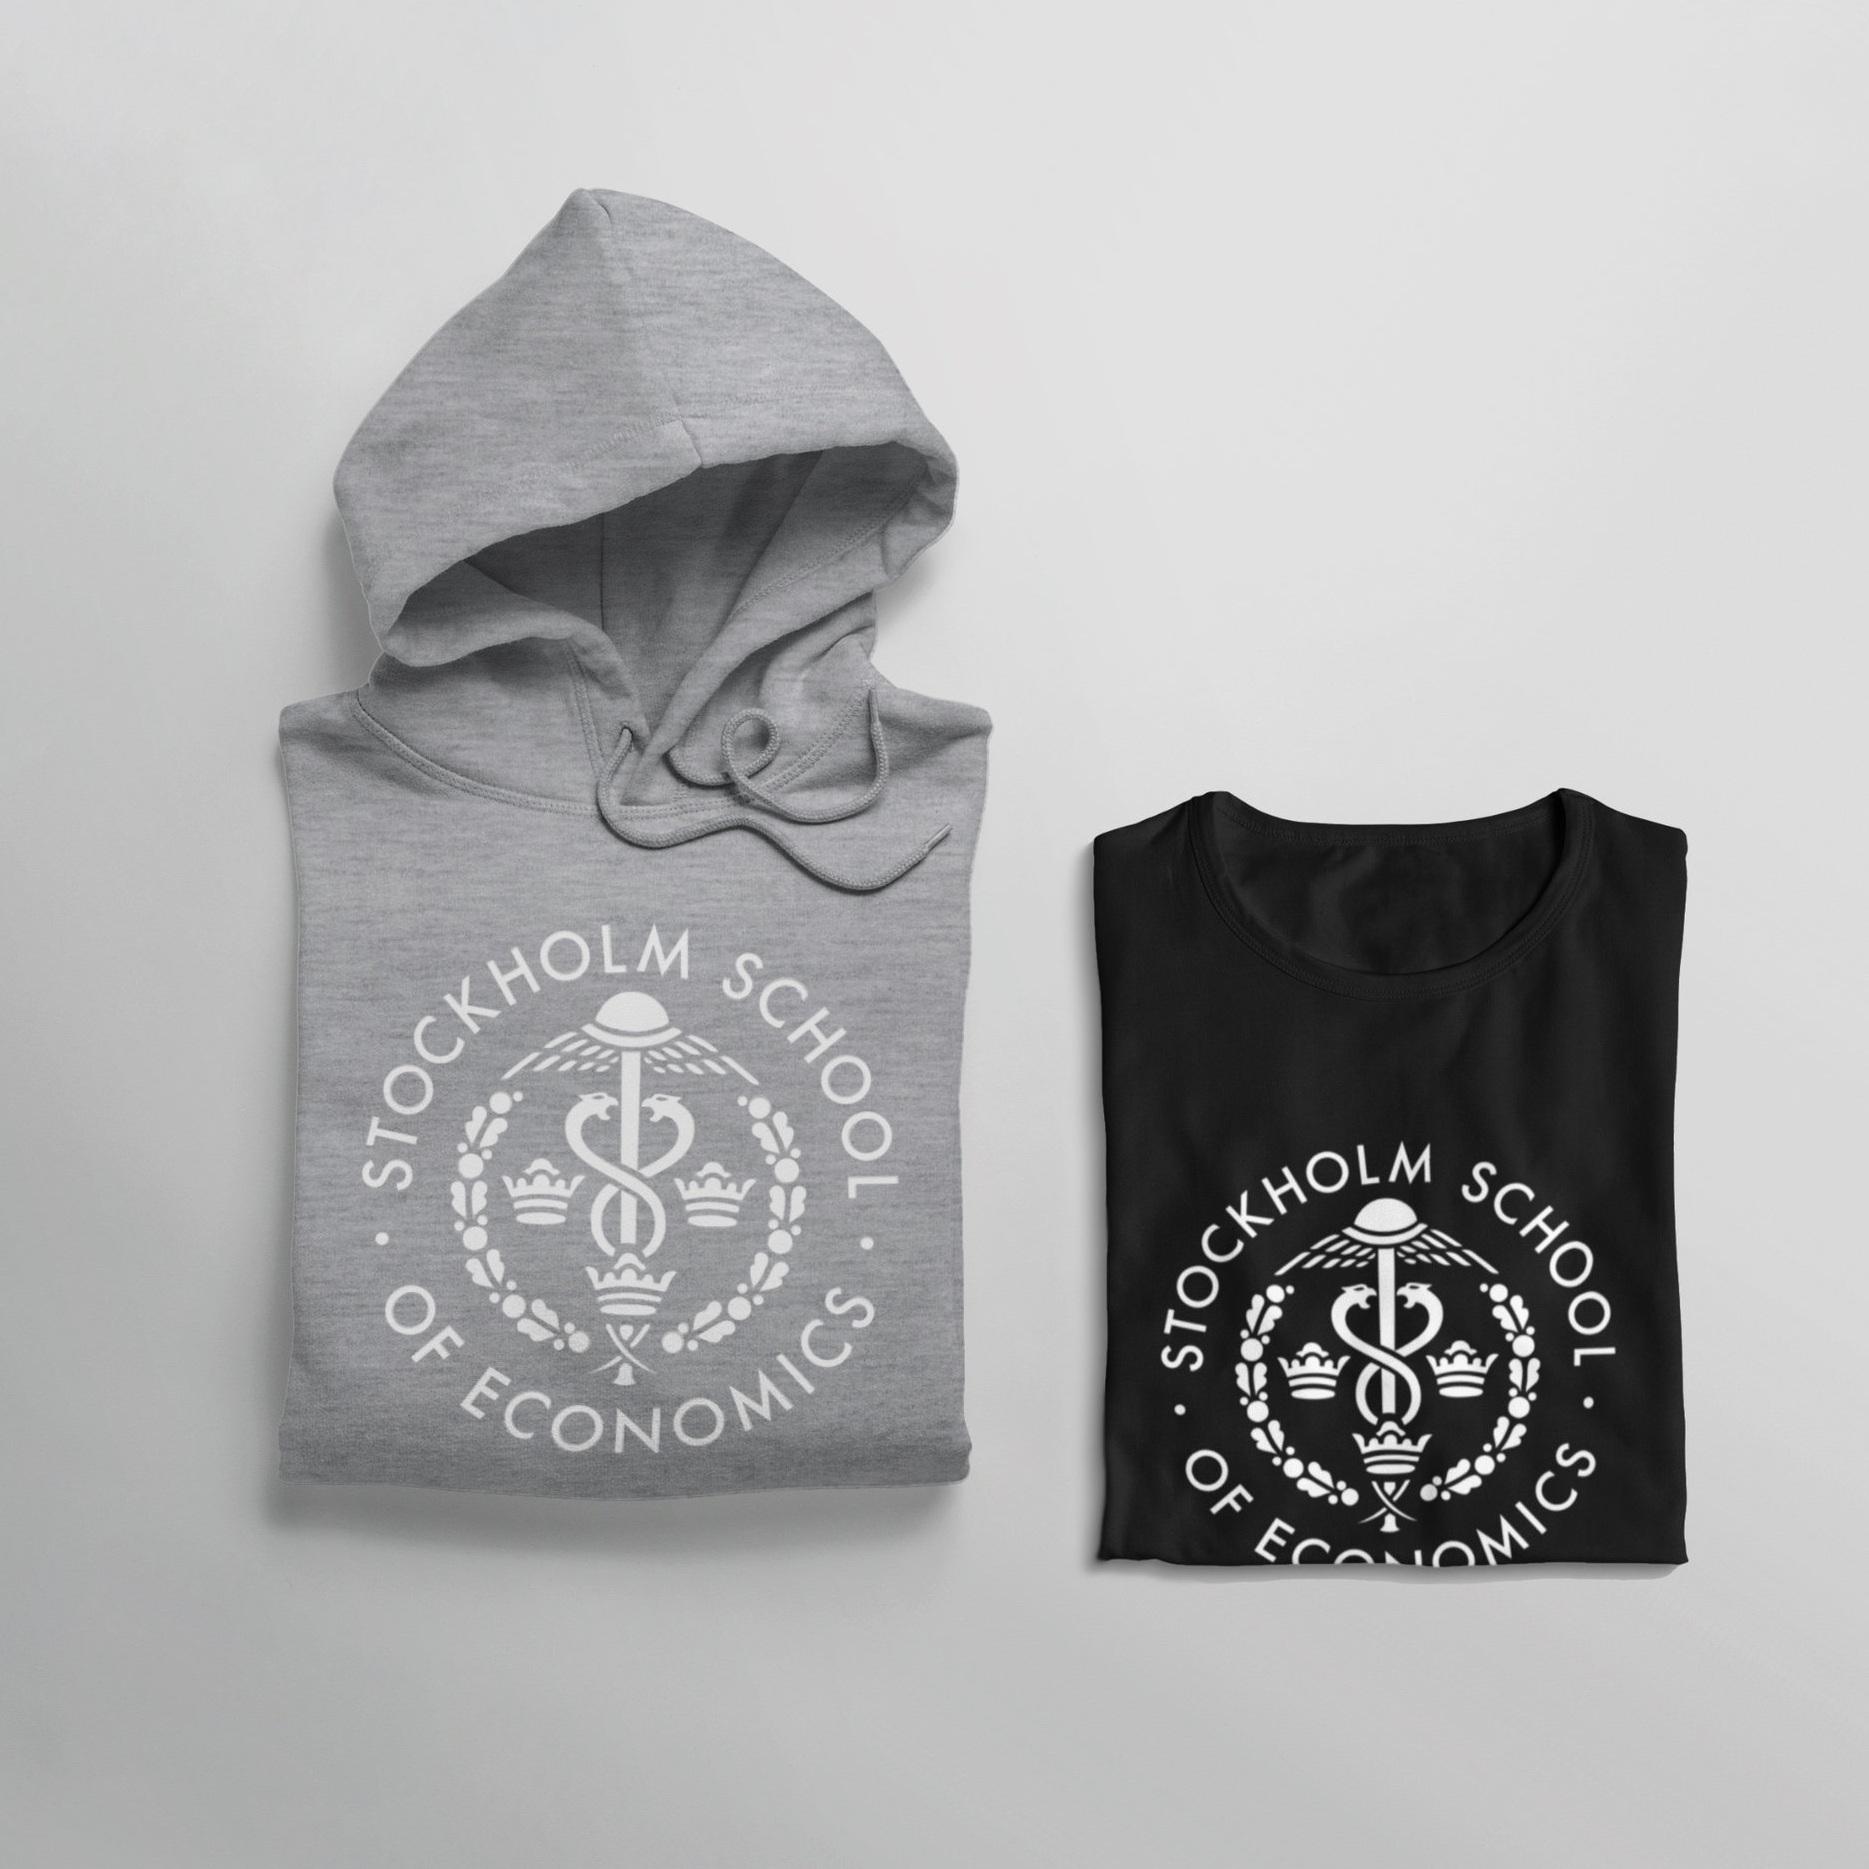 Stockholm School of Economics - Kollektion / webshop / HEMLEVERANS